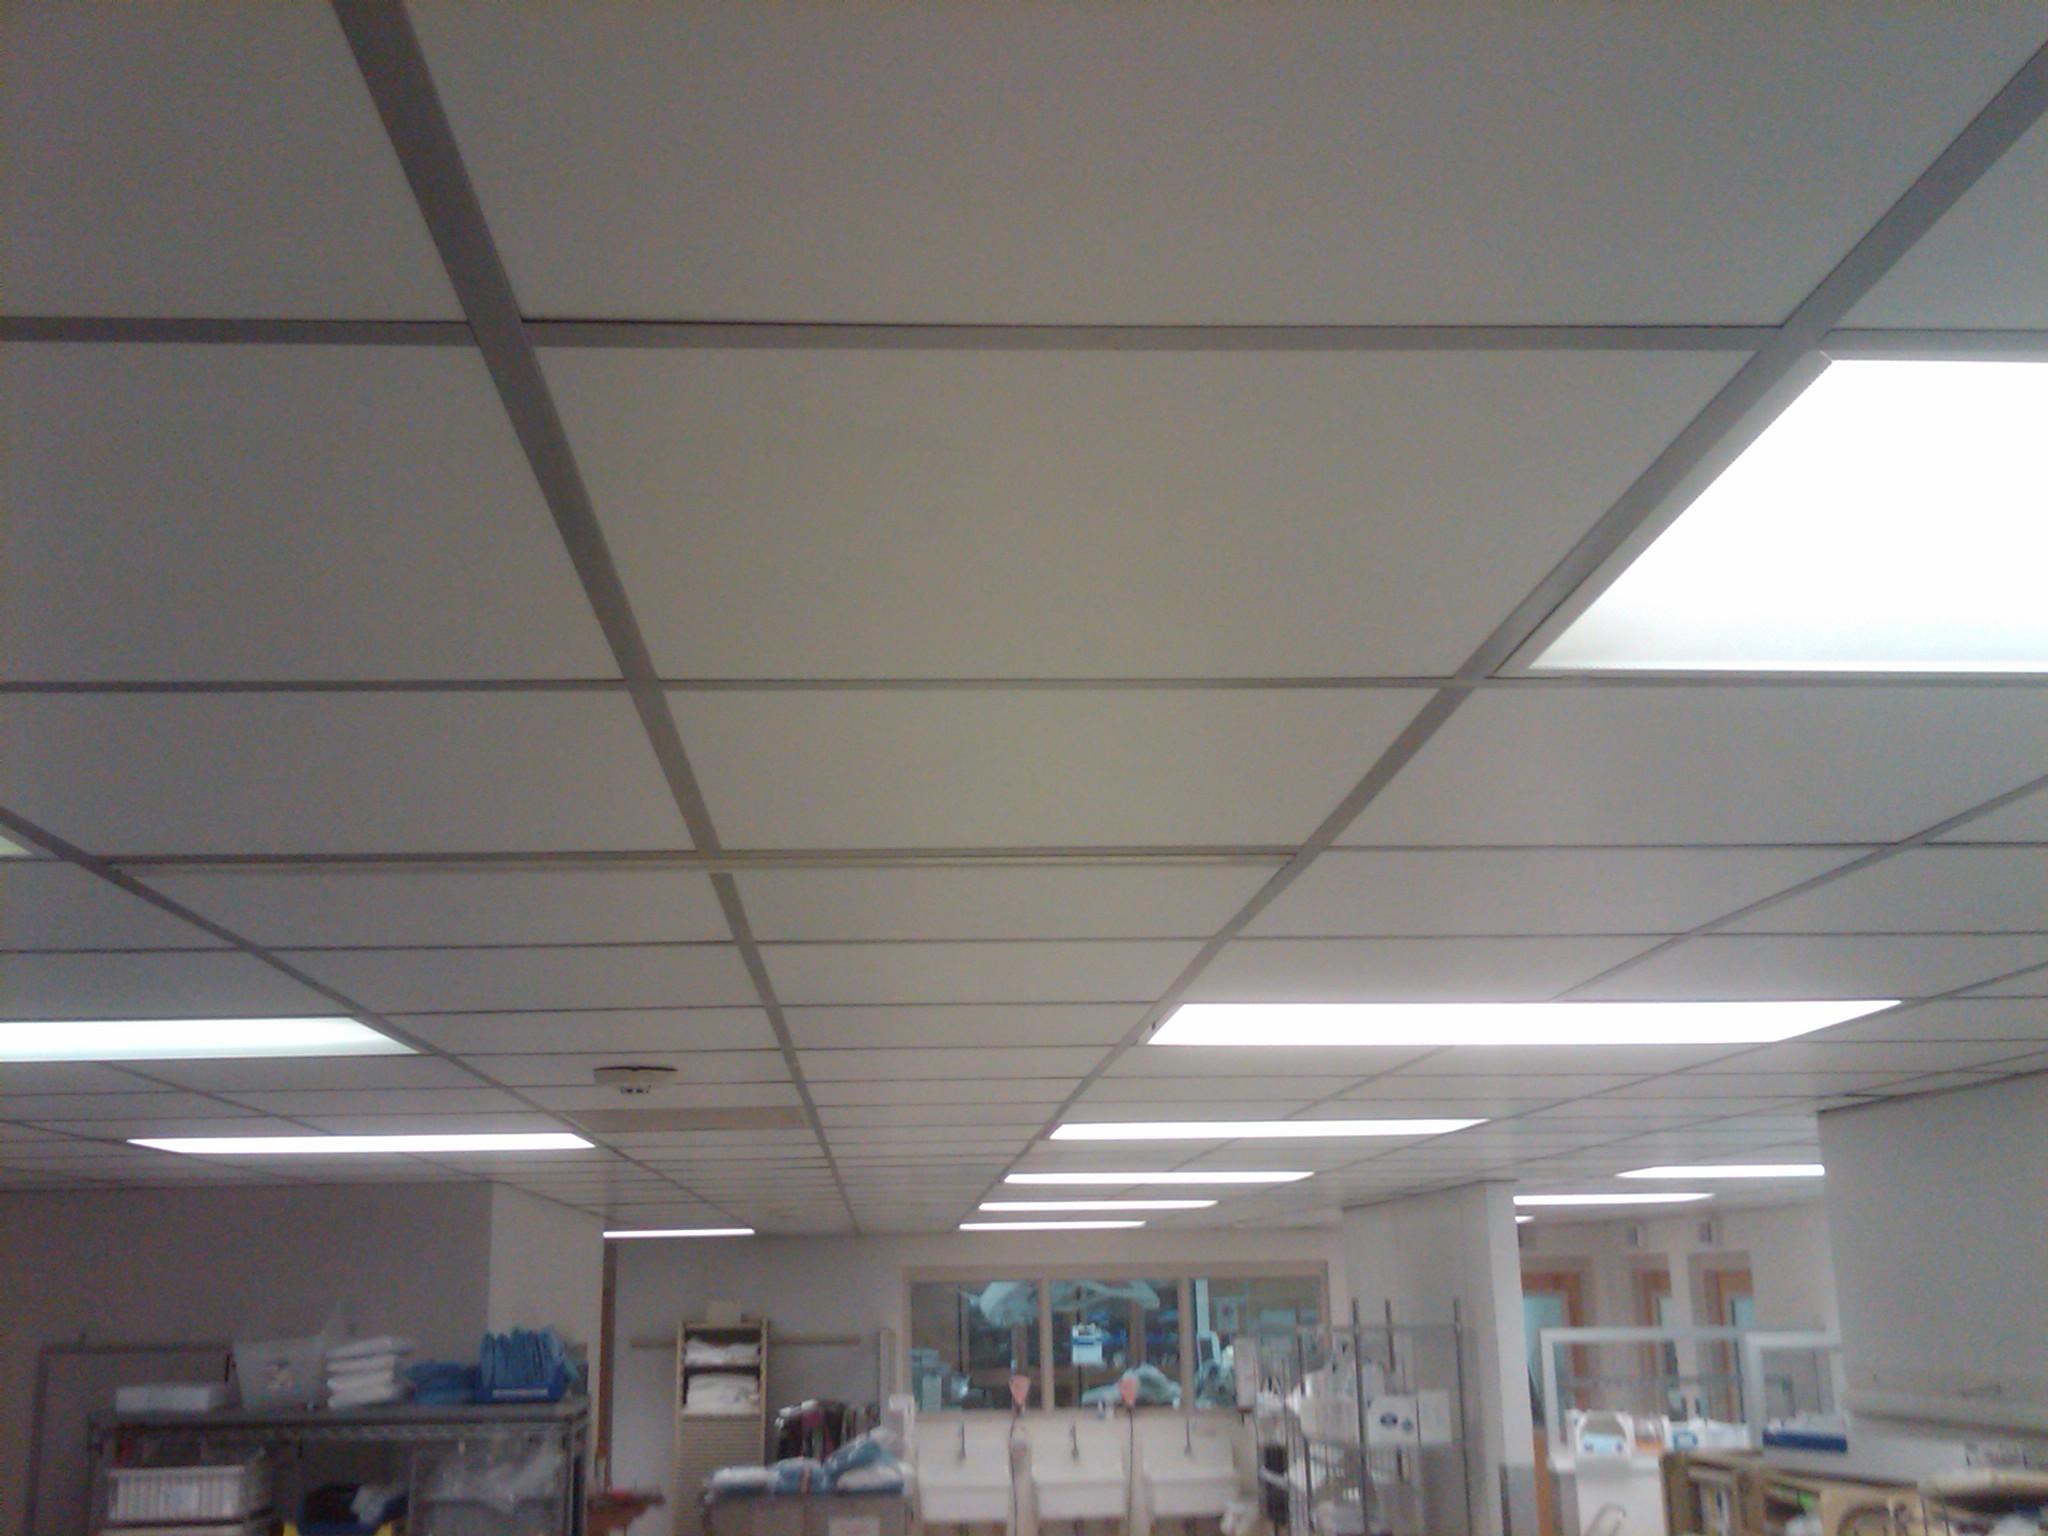 Duroglas Plus Pvc Clean Room Ceiling Tiles Intersource